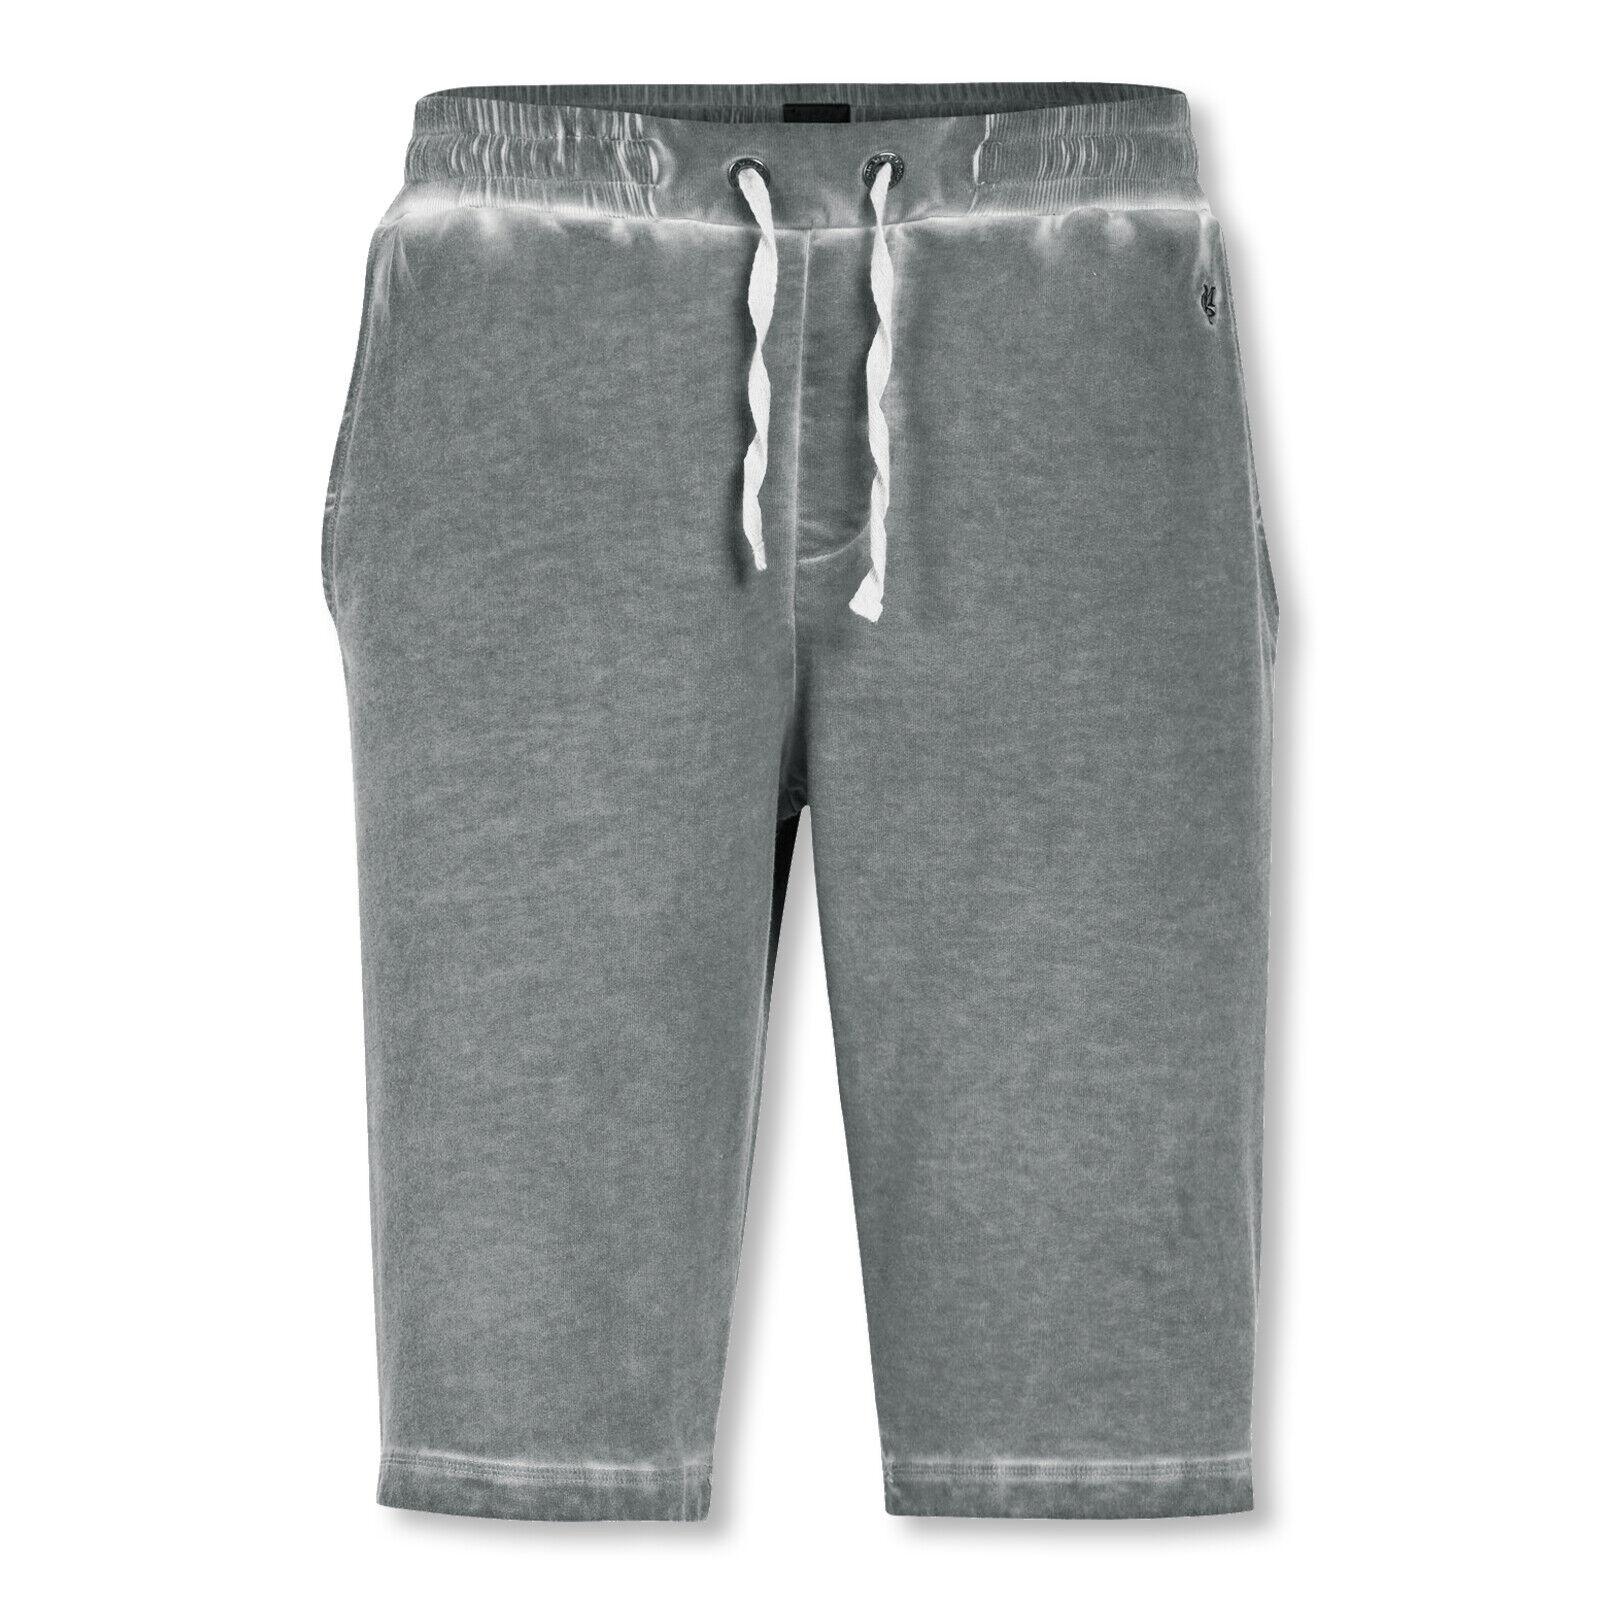 Marc O'Polo Herren Lounge-Pant Sweatpants Bermuda Homewear Pants kurz M L XL 2XL    | Üppiges Design